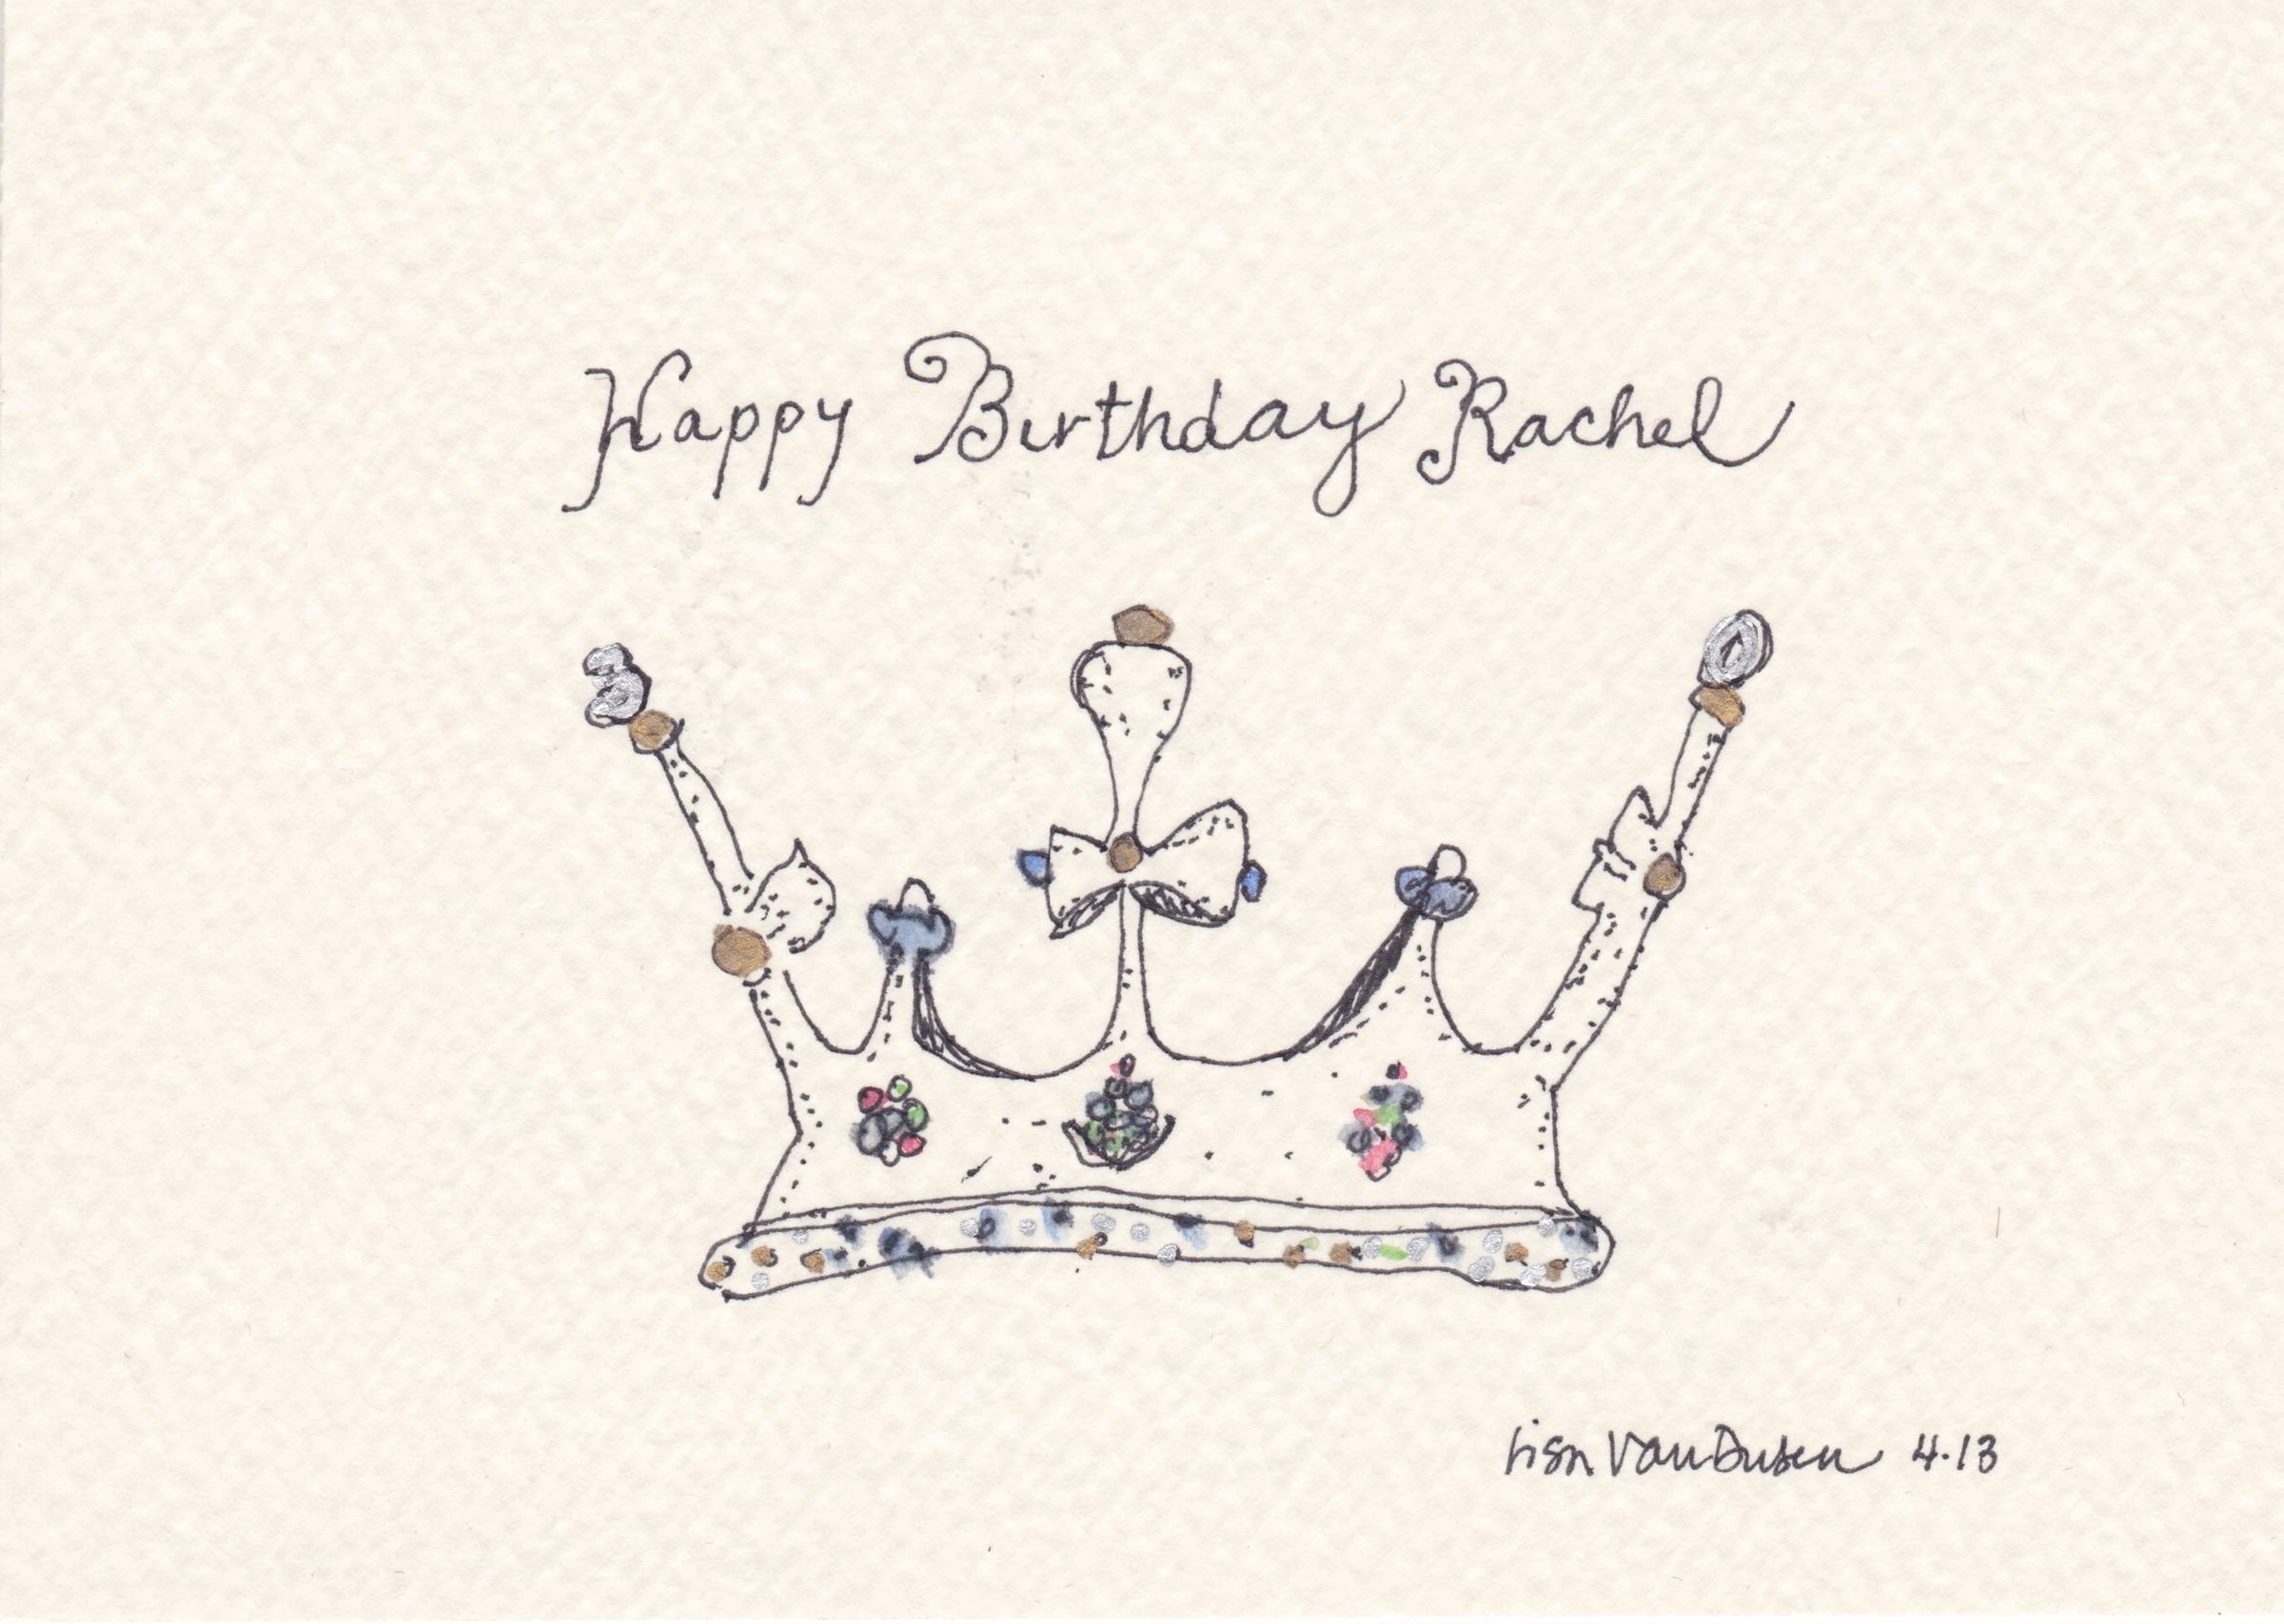 a crown for rachel 4_13 copy.jpg